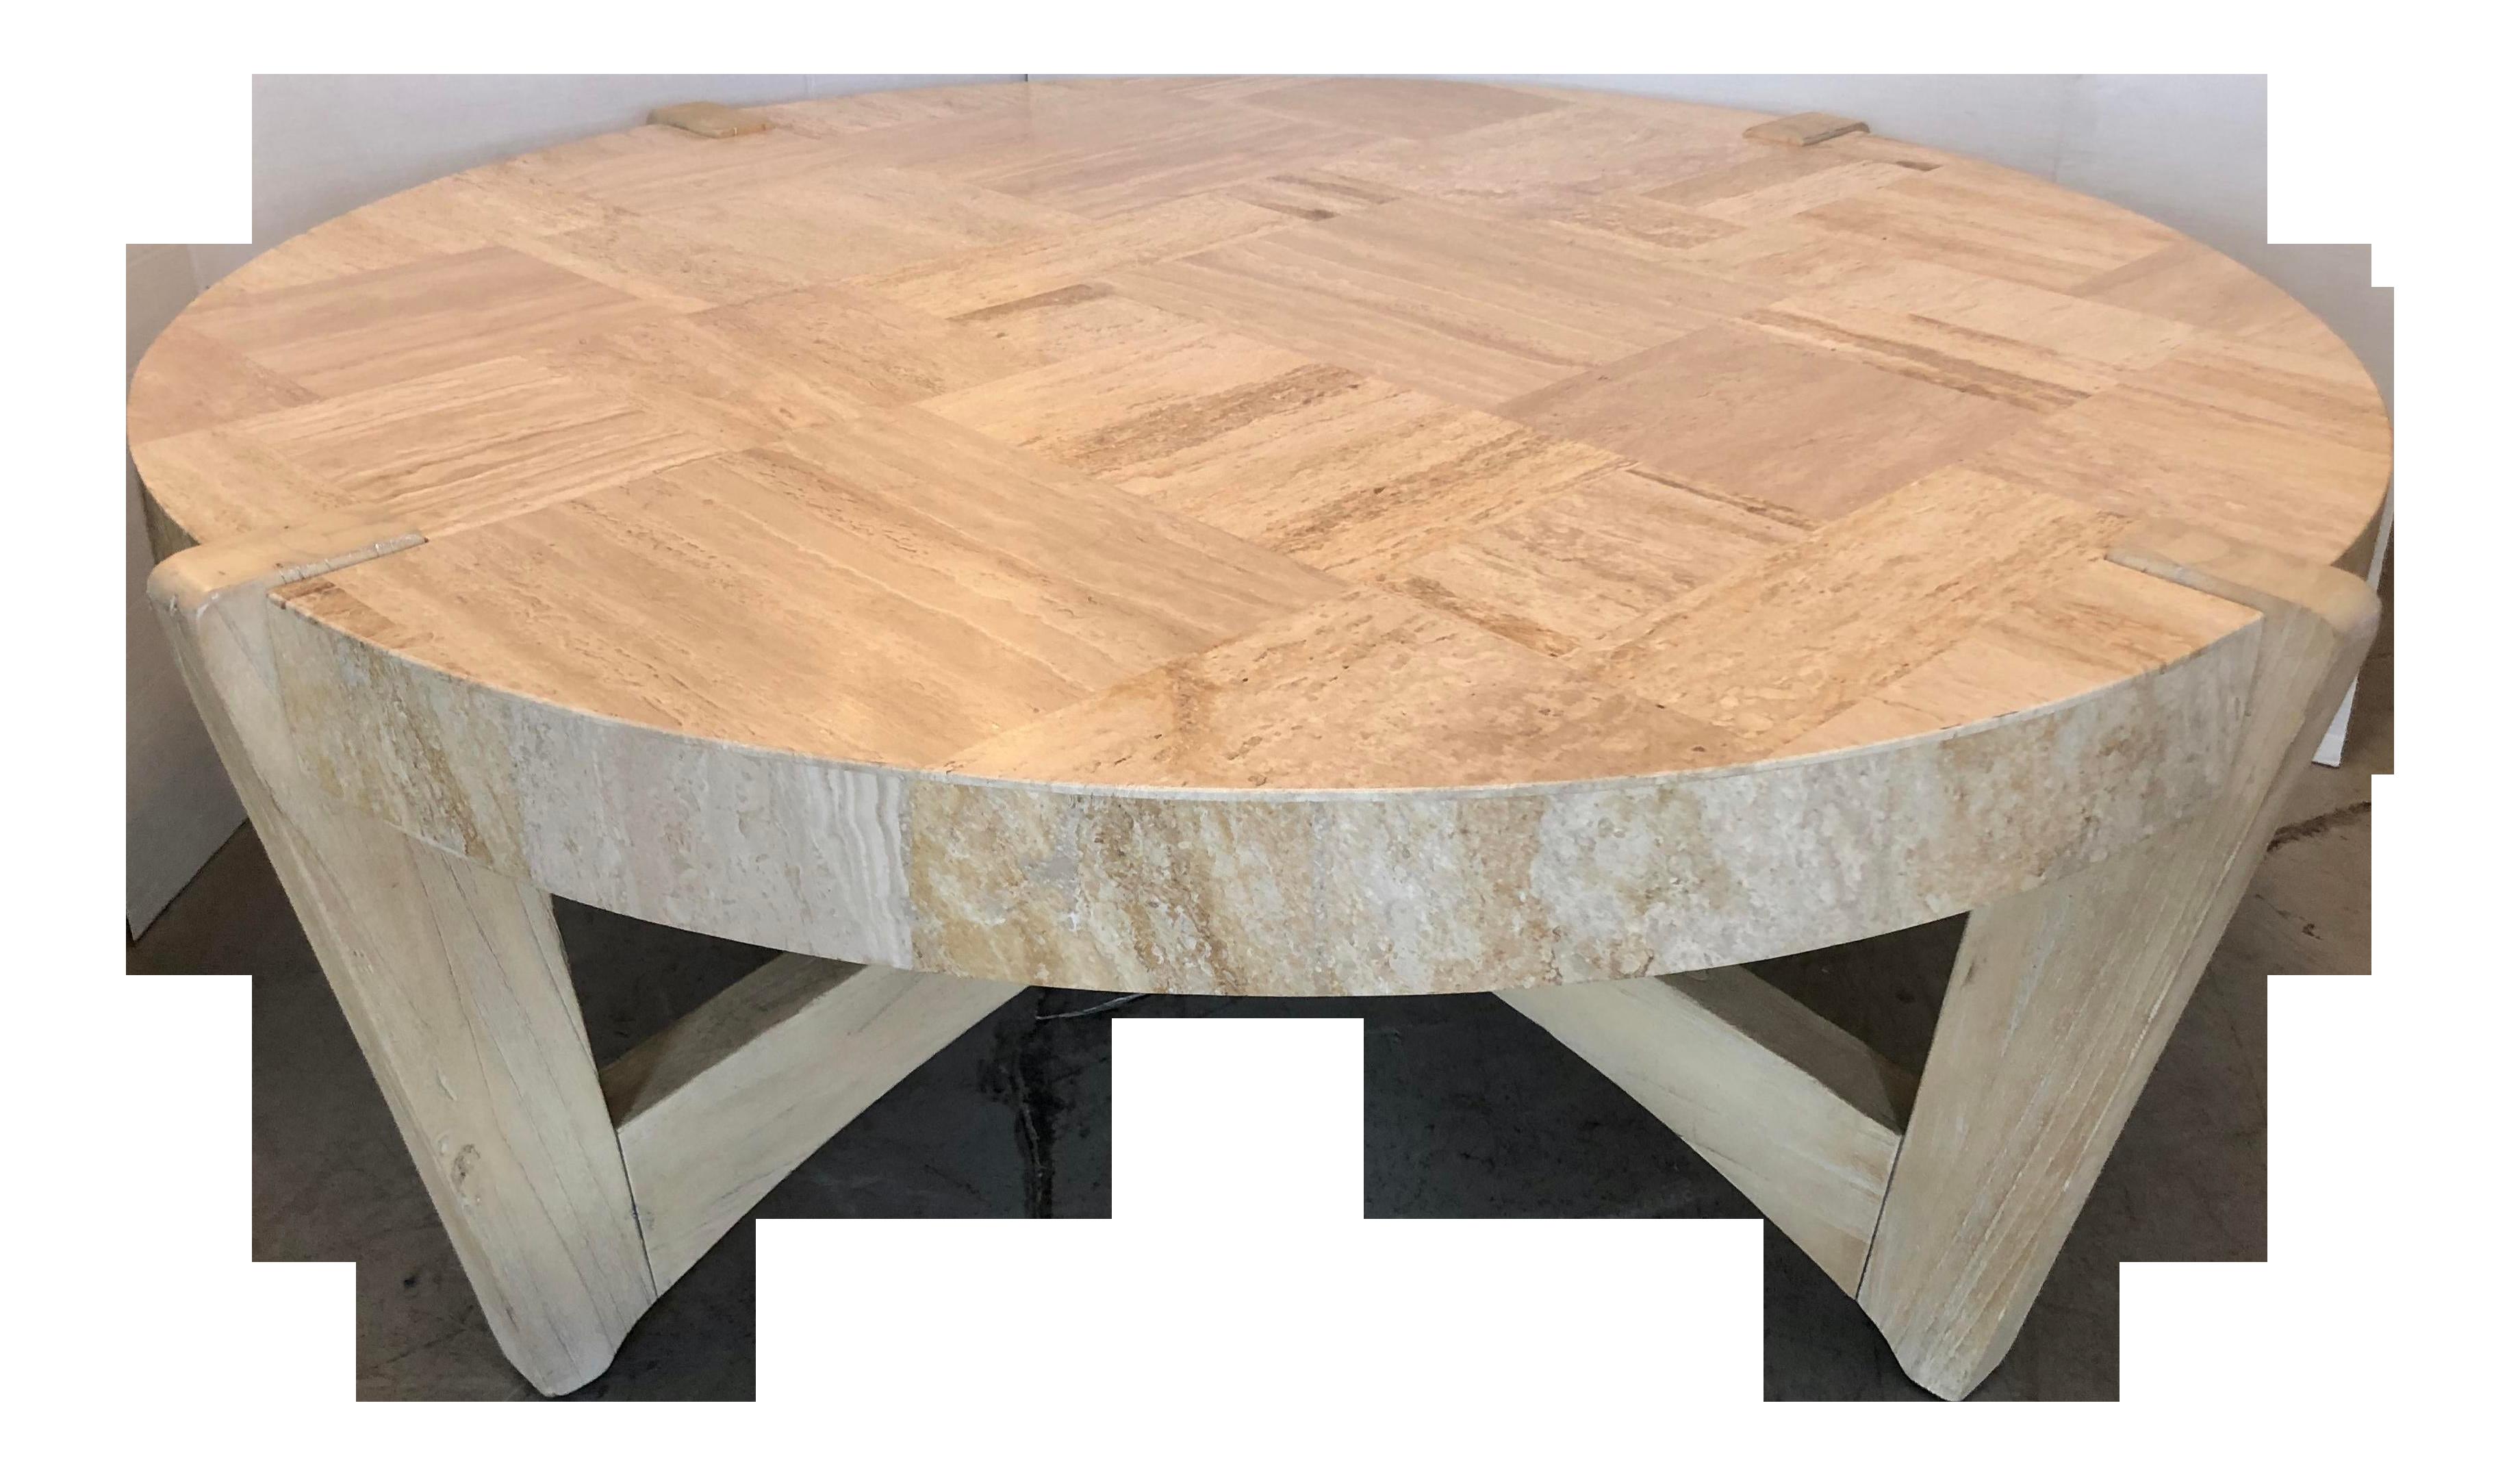 Pin By Crista Azqueta Kobza On 251 Tangier Coffee Table Coffee Table Wood Modern Table [ 2154 x 3681 Pixel ]